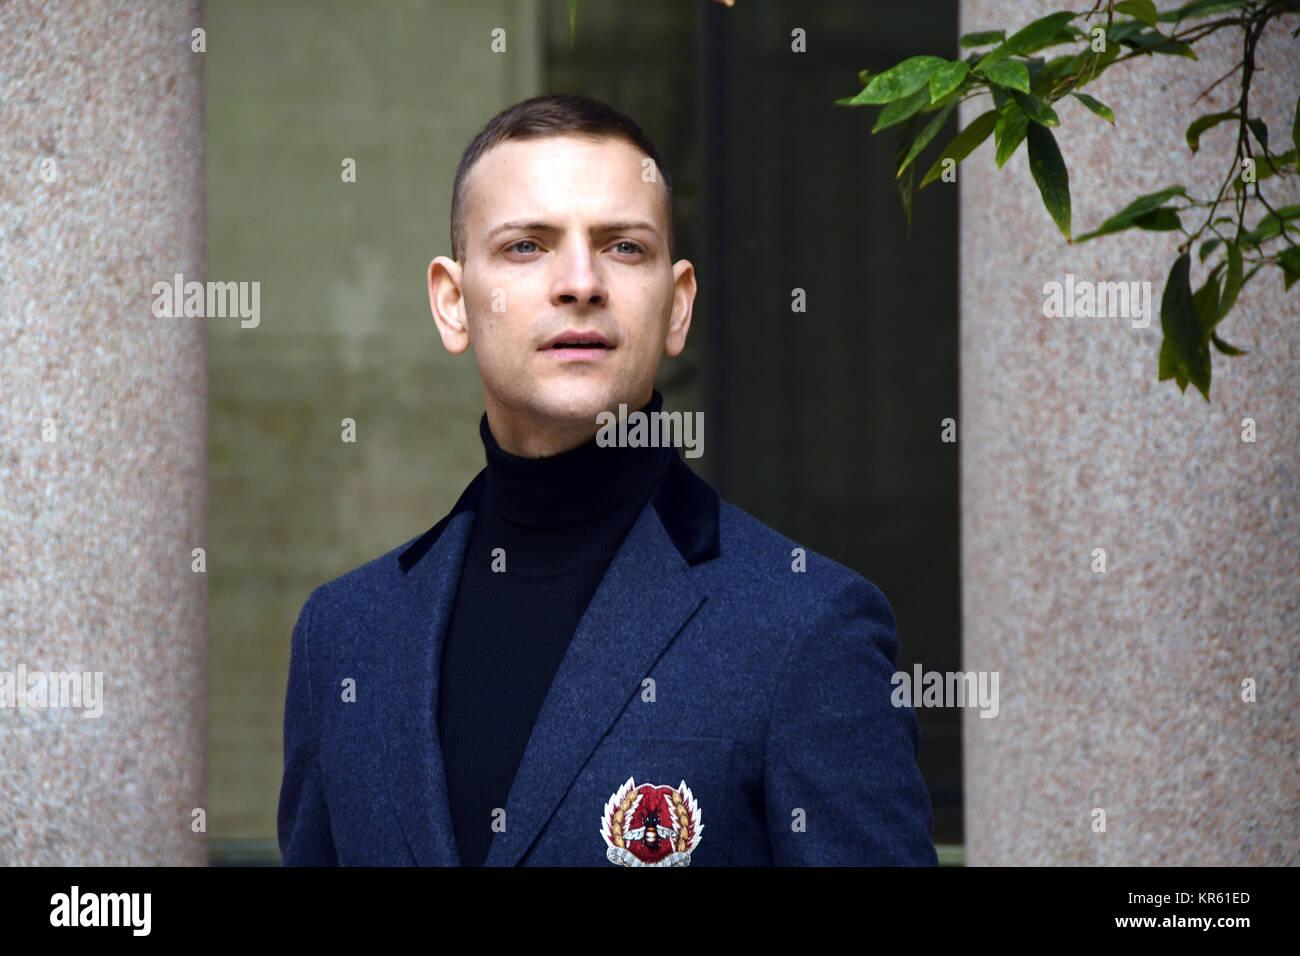 Rome Italy 18 December 2017 Photocall Presentation Film Napoli Stock Photo Alamy